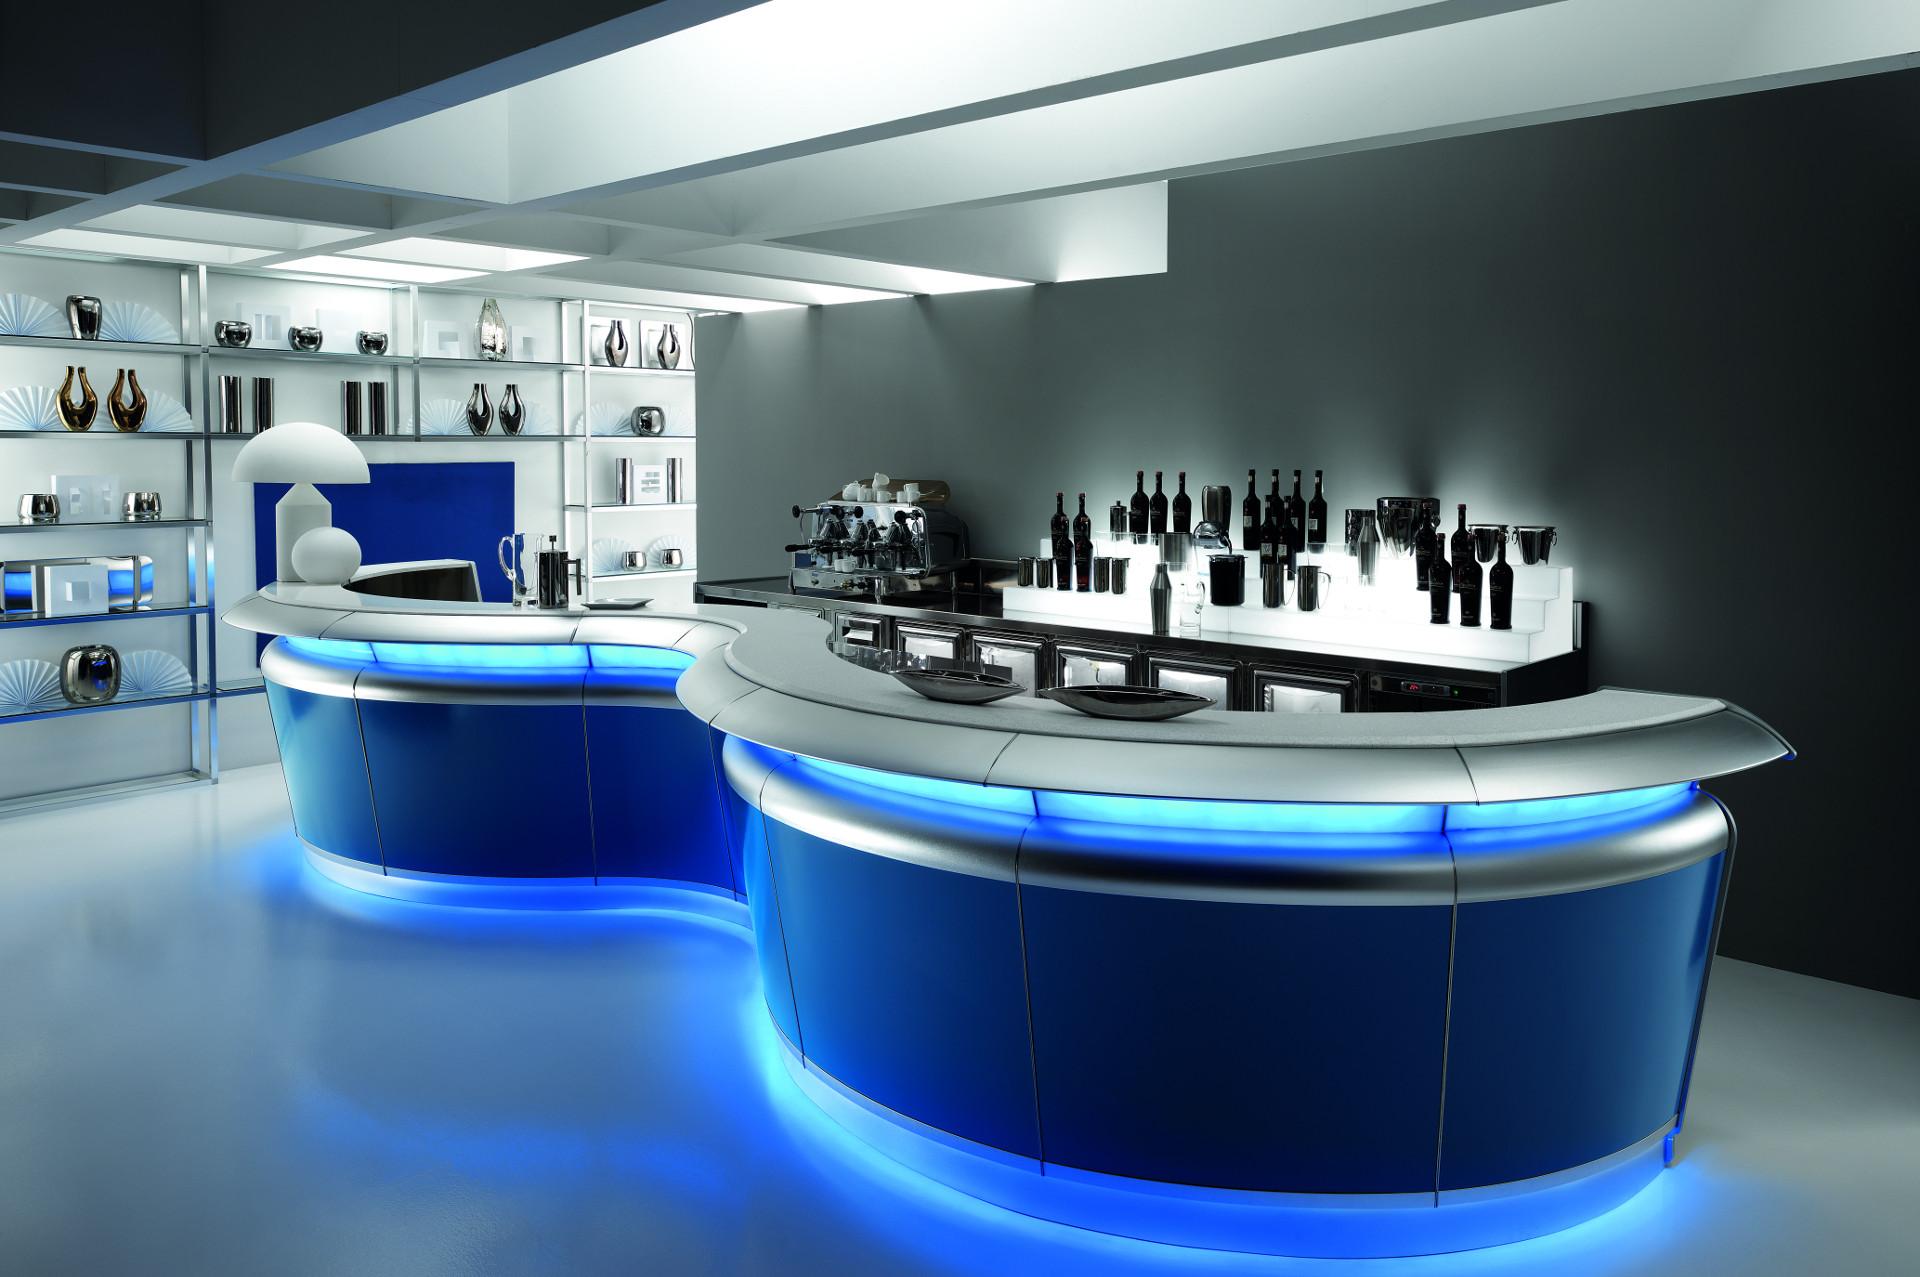 Arredamenti e attrezzature per bar ristoranti gelaterie for Arredamenti cagliari